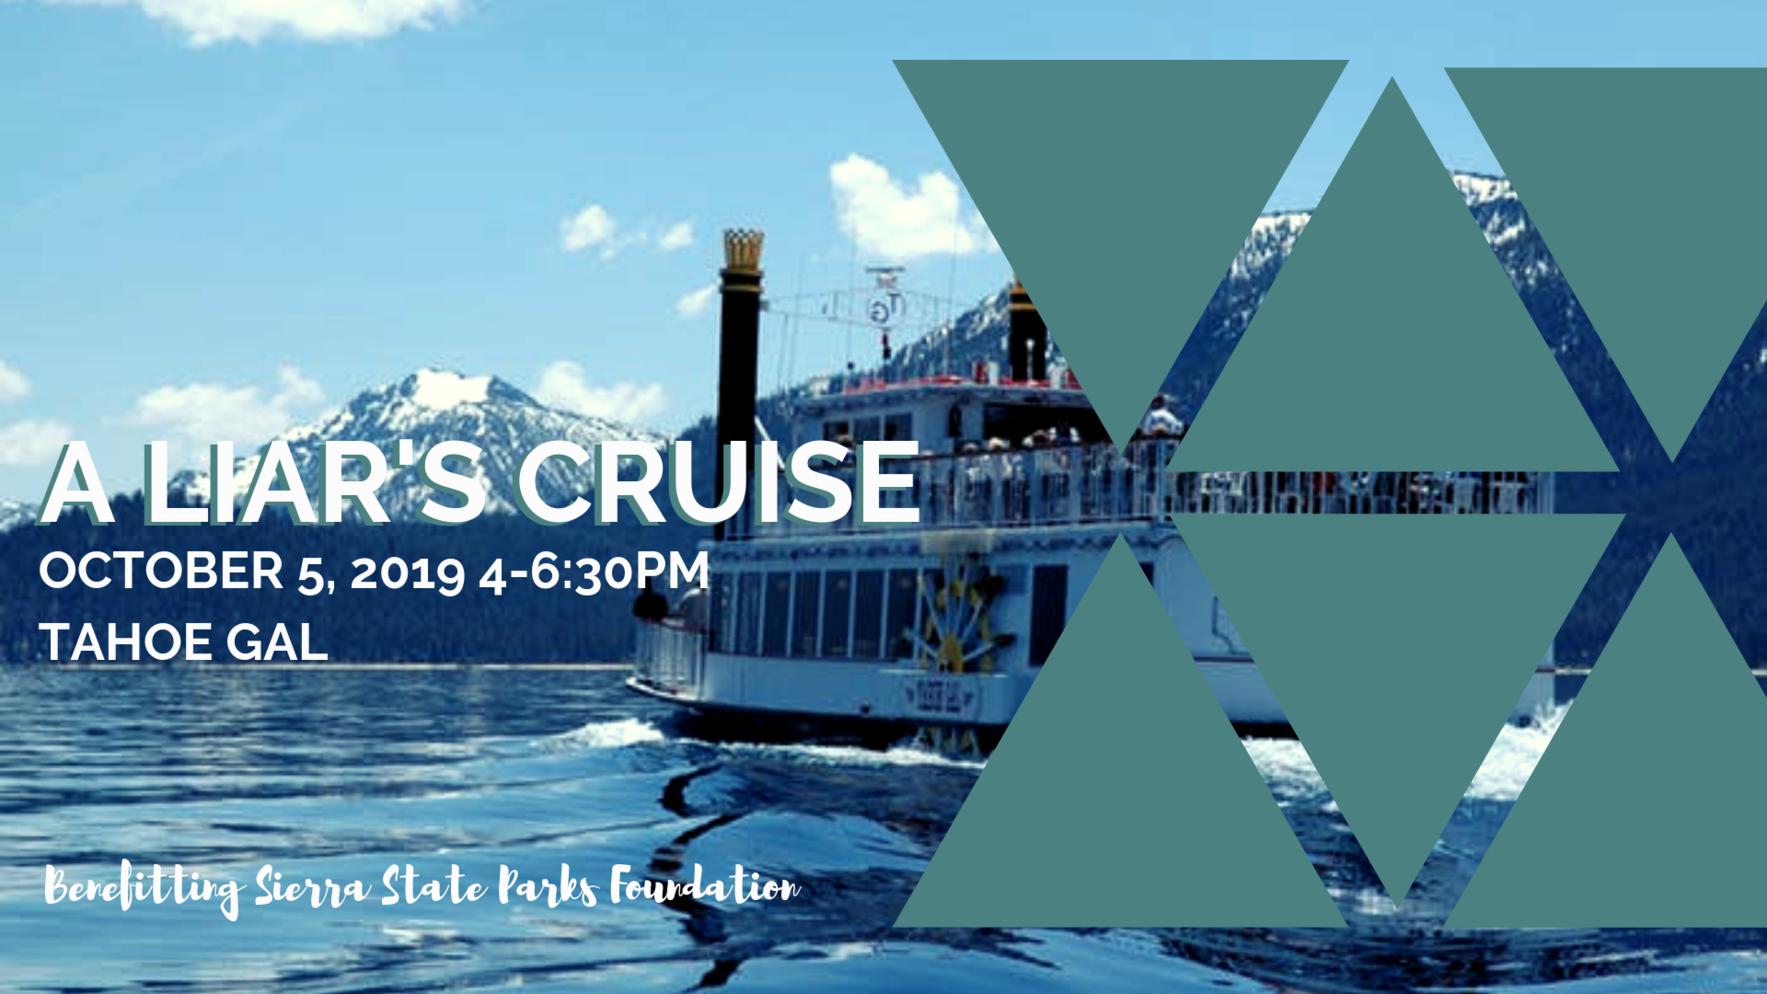 A Liar's Cruise image